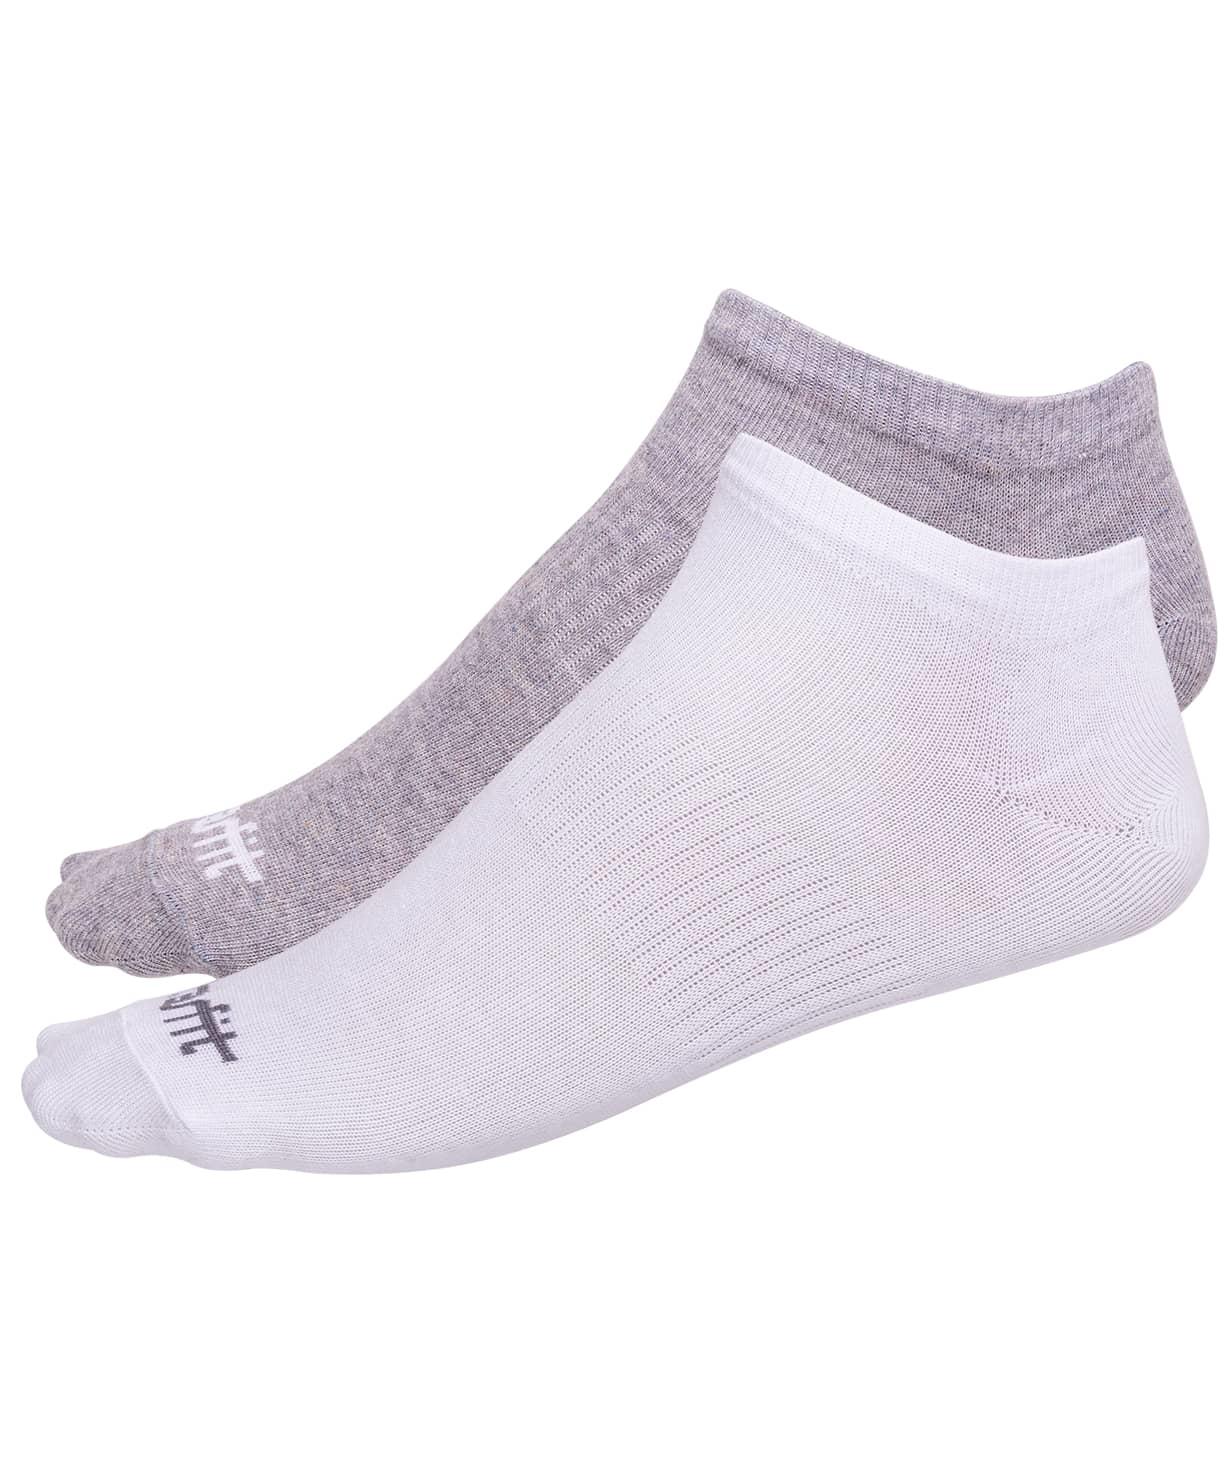 Носки низкие SW-205, белый/светло-серый меланж, 2 пары